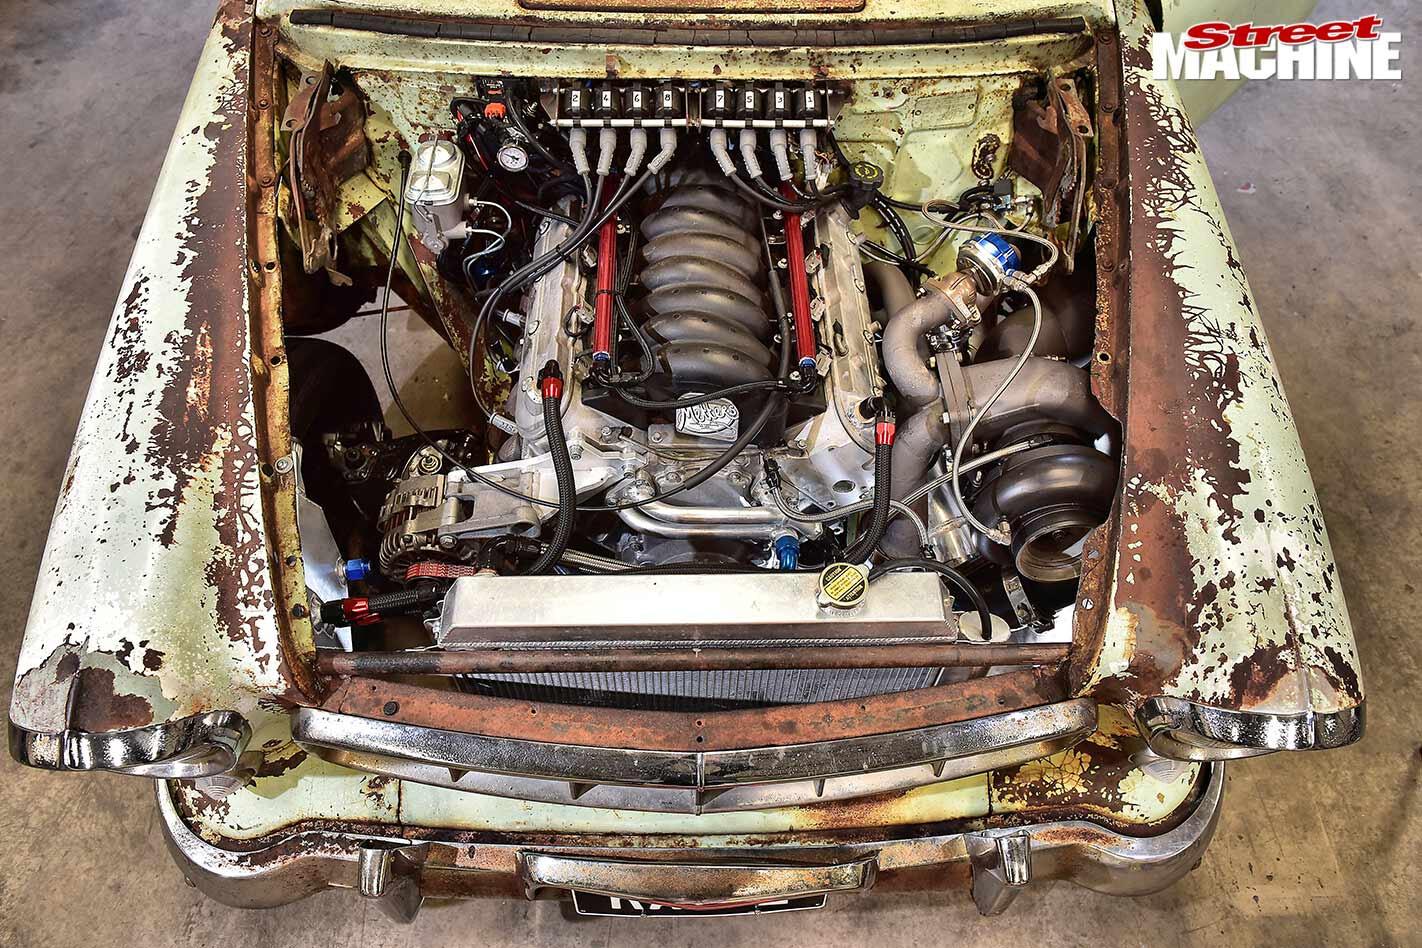 FE Holden engine bay